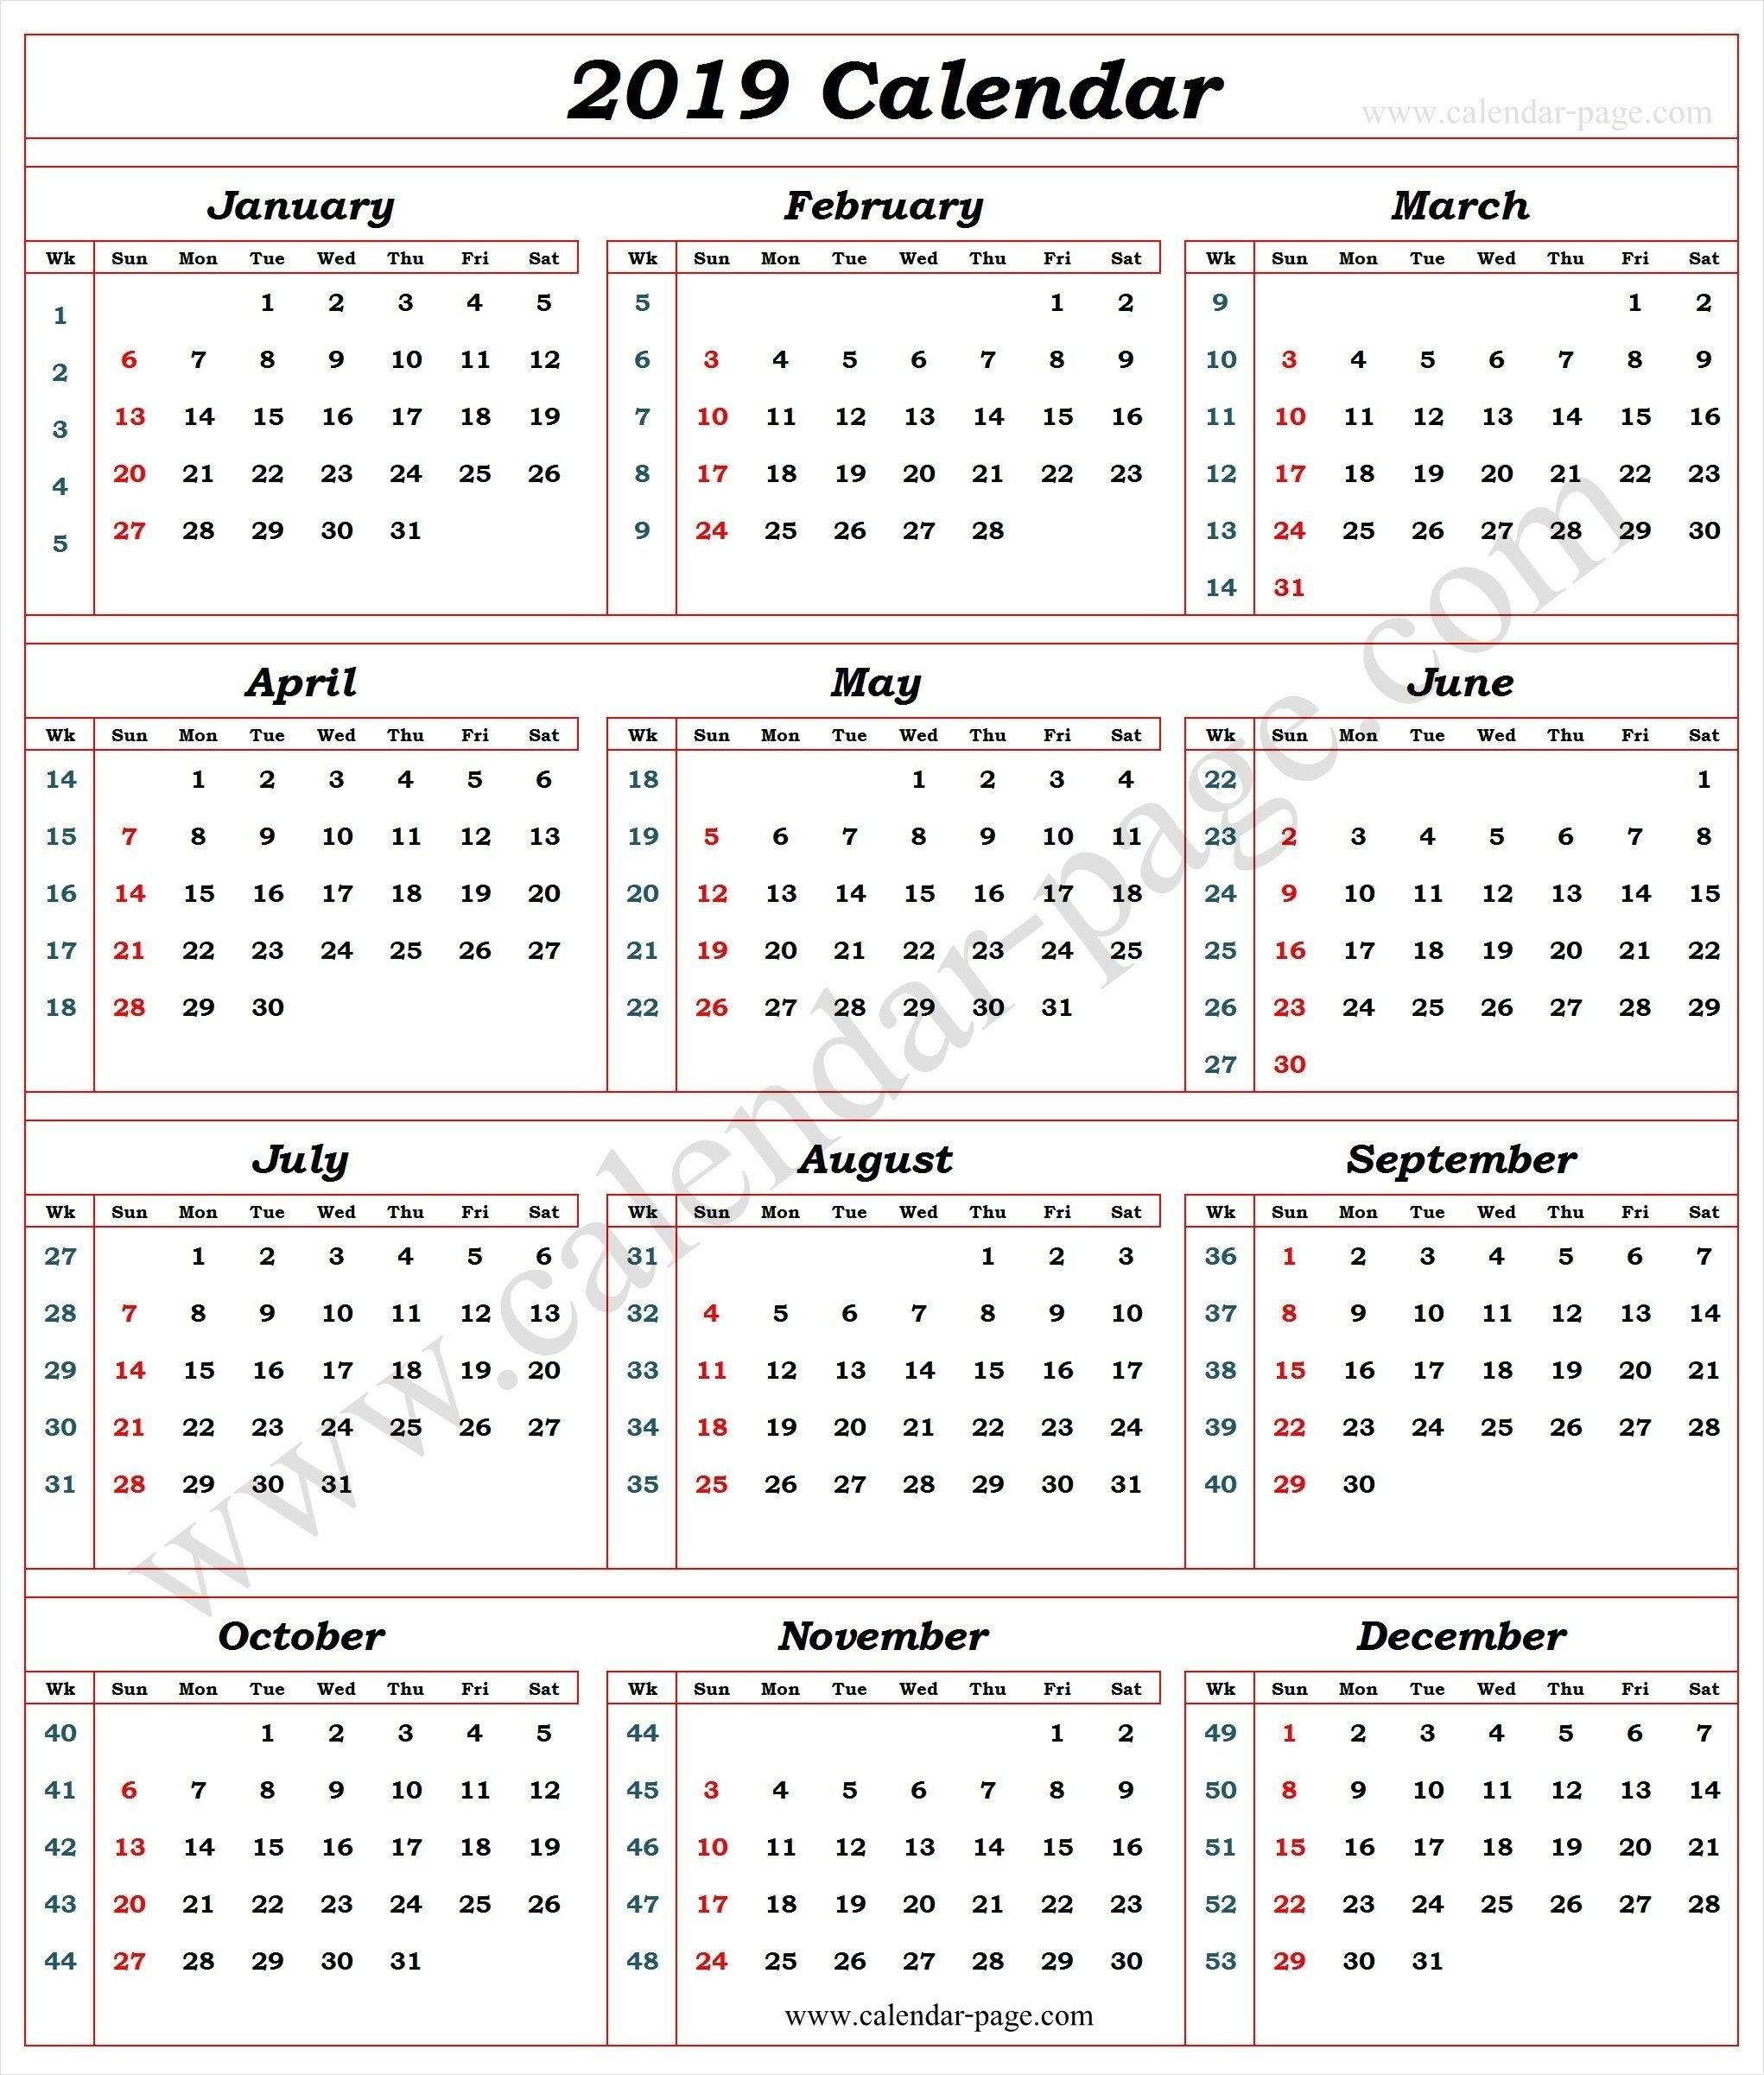 Calendar 2019 With Week Numbers | 2019 Calendar Template | Pinterest Week 9 Calendar 2019